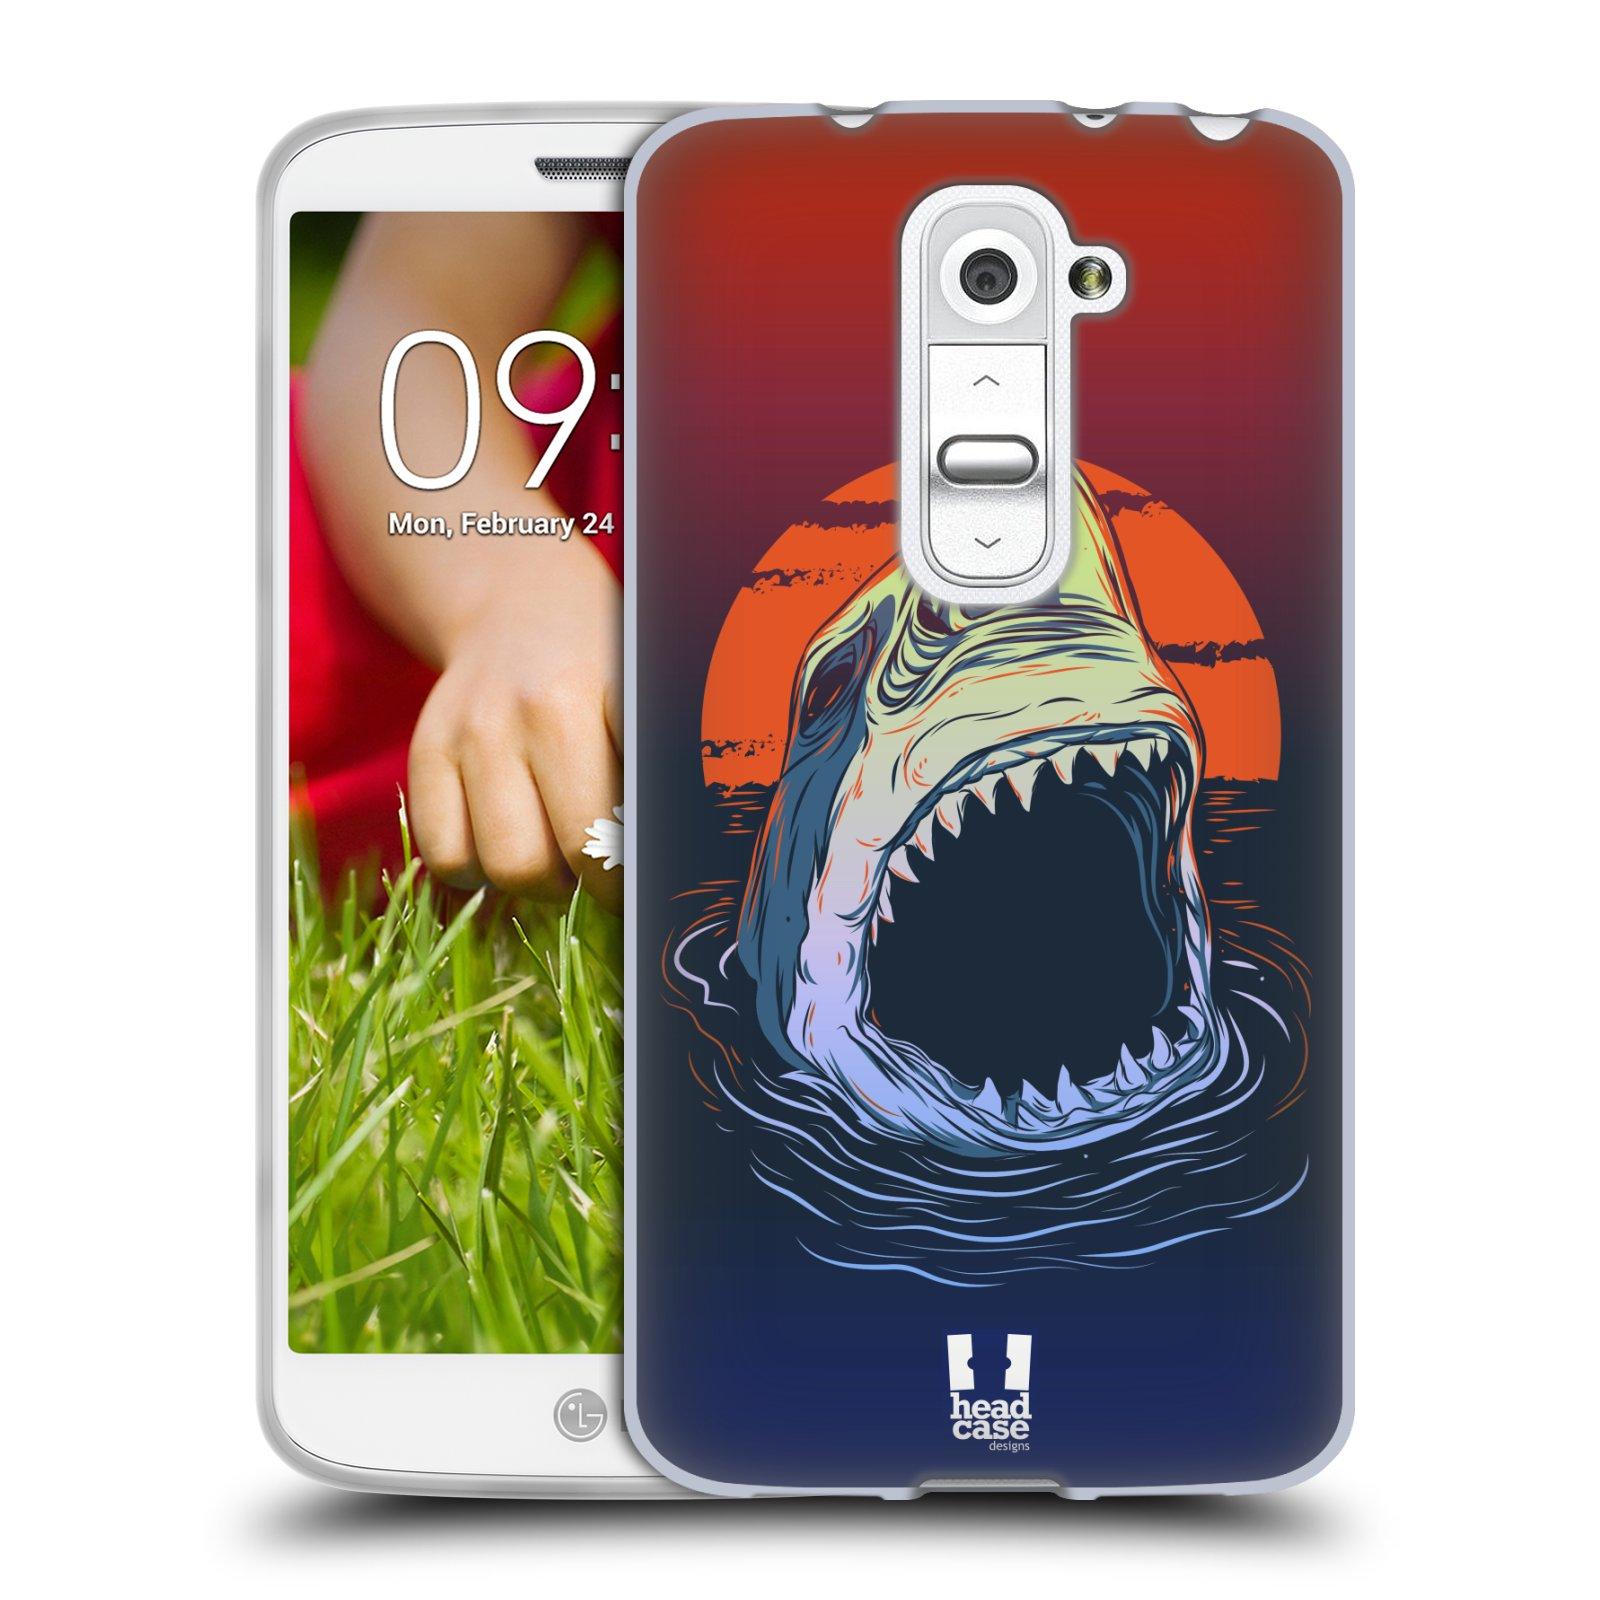 Silikonové pouzdro na mobil LG G2 Mini HEAD CASE HLADOVÝ ŽRALOK (Silikonový kryt či obal na mobilní telefon LG G2 Mini D620)